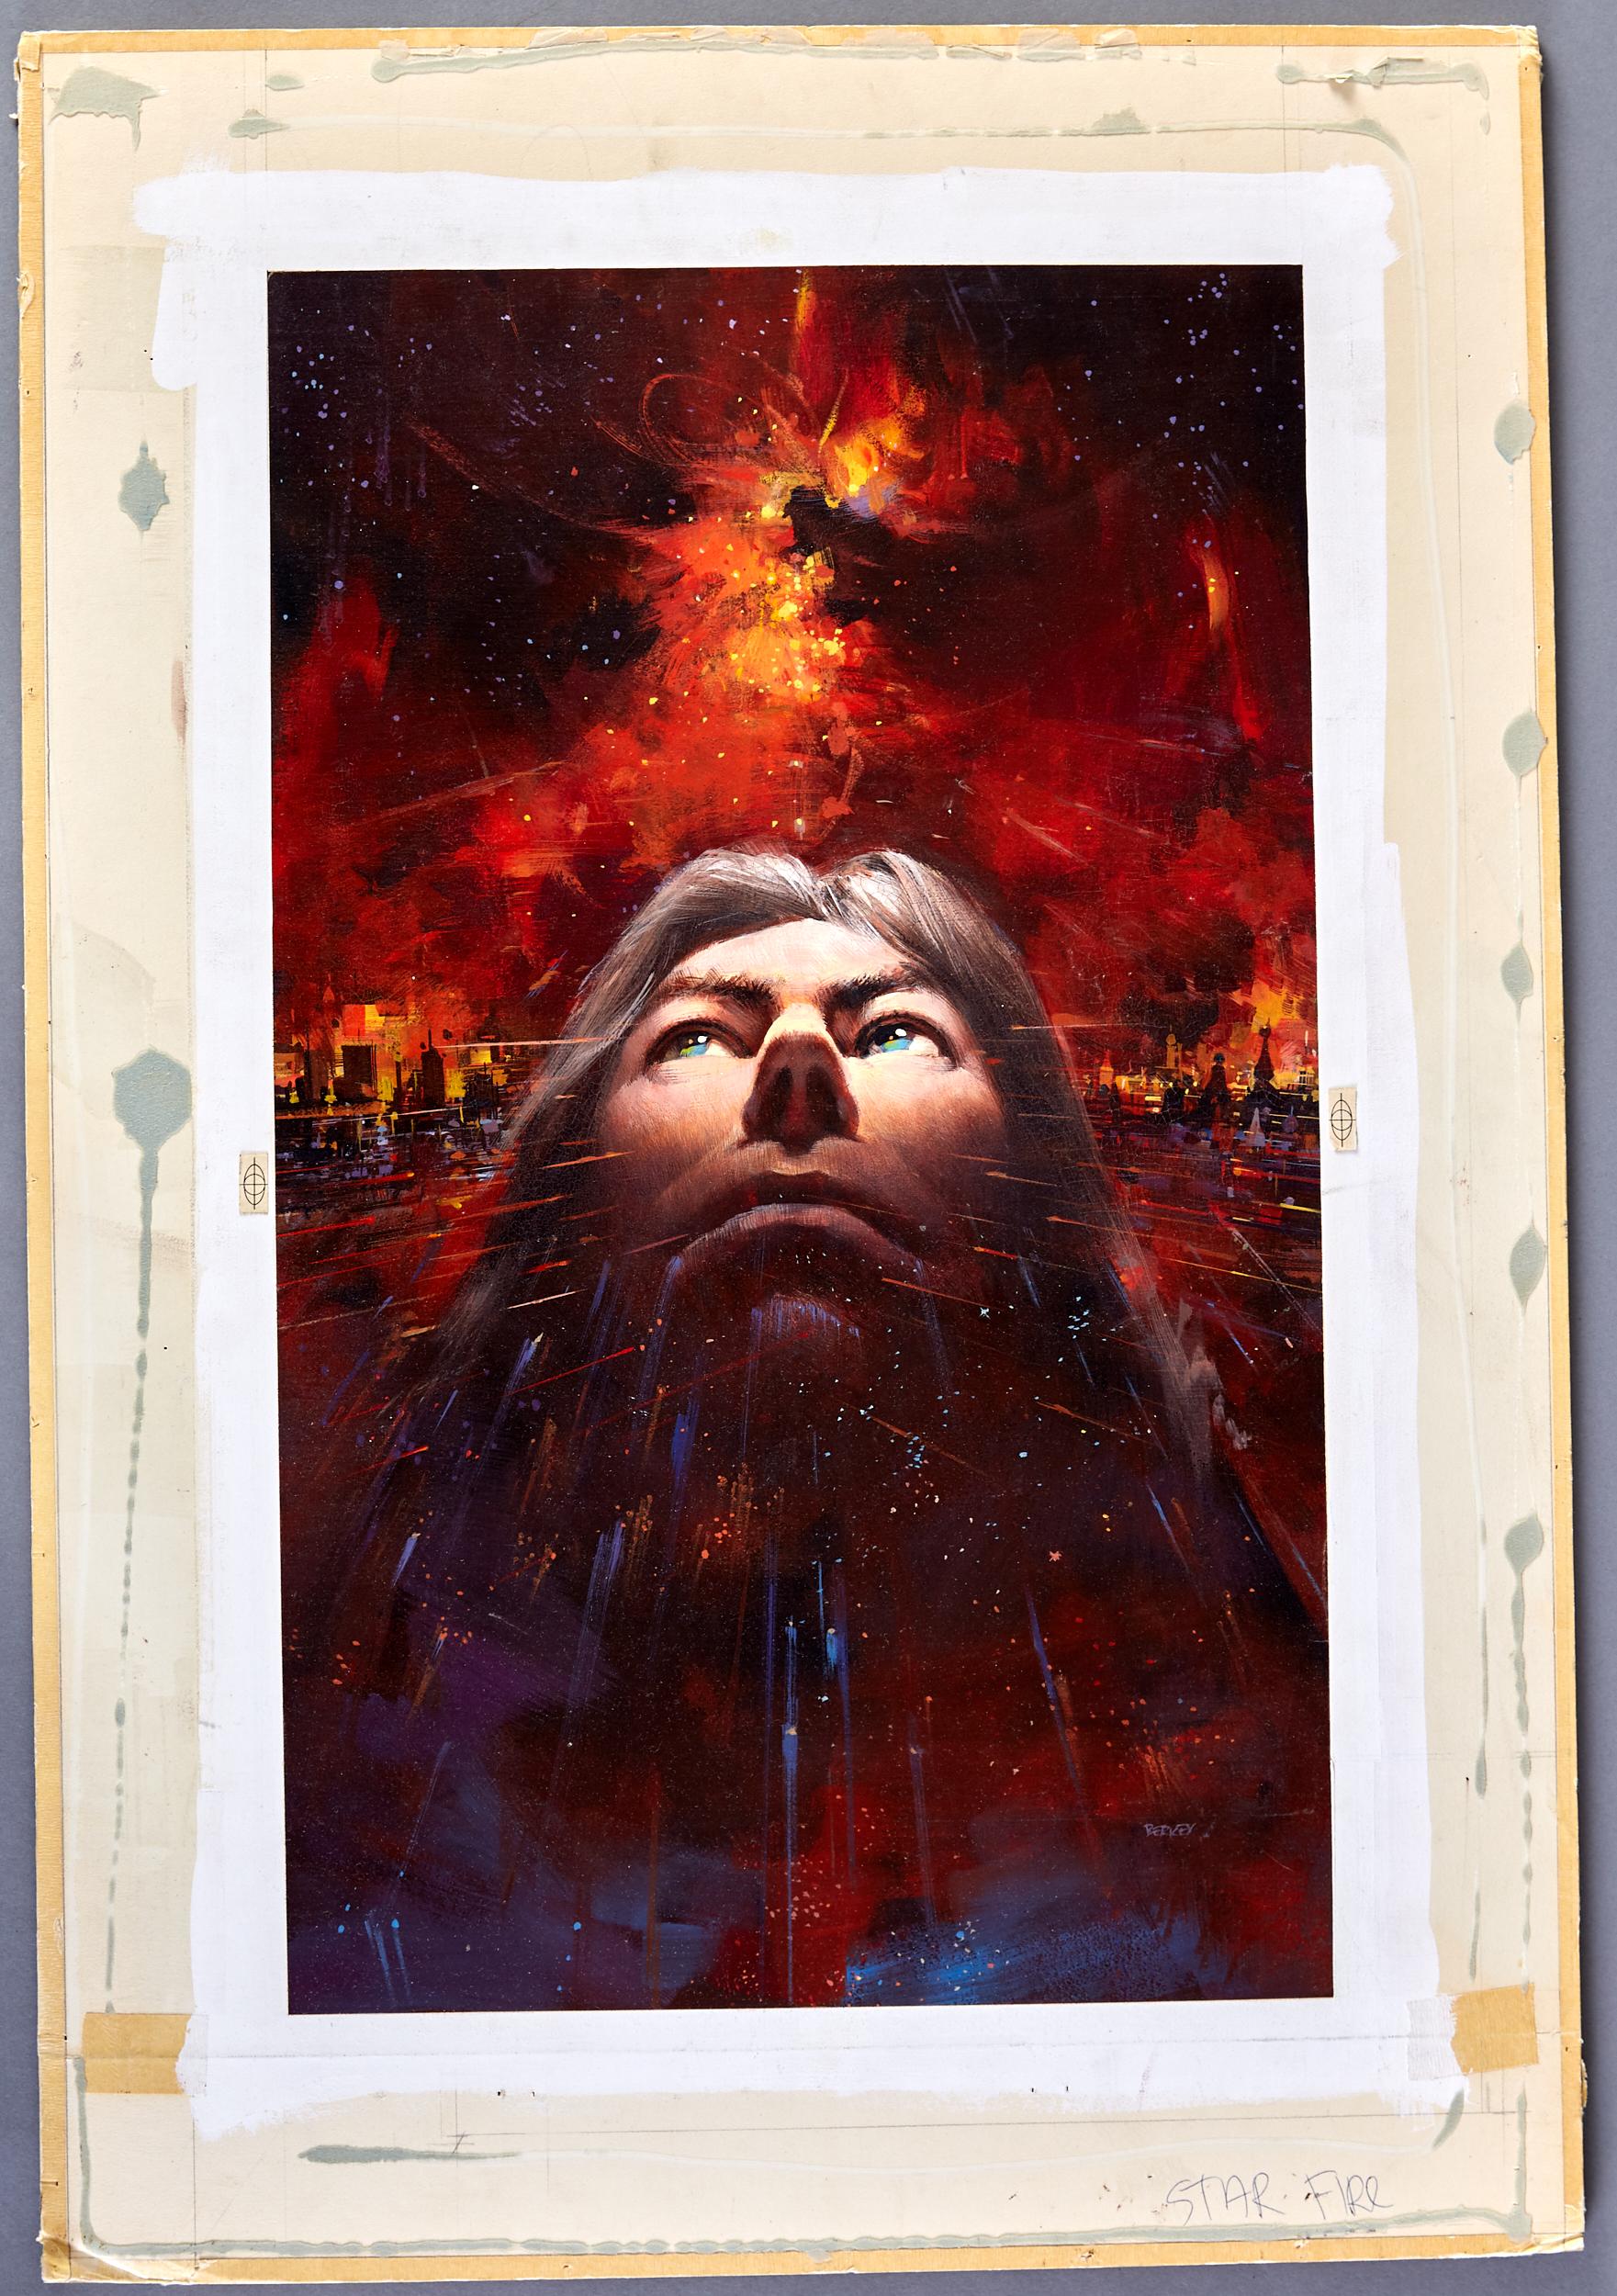 Lot 37 - John Berkey Star Fire Book Cover Illustration Painting